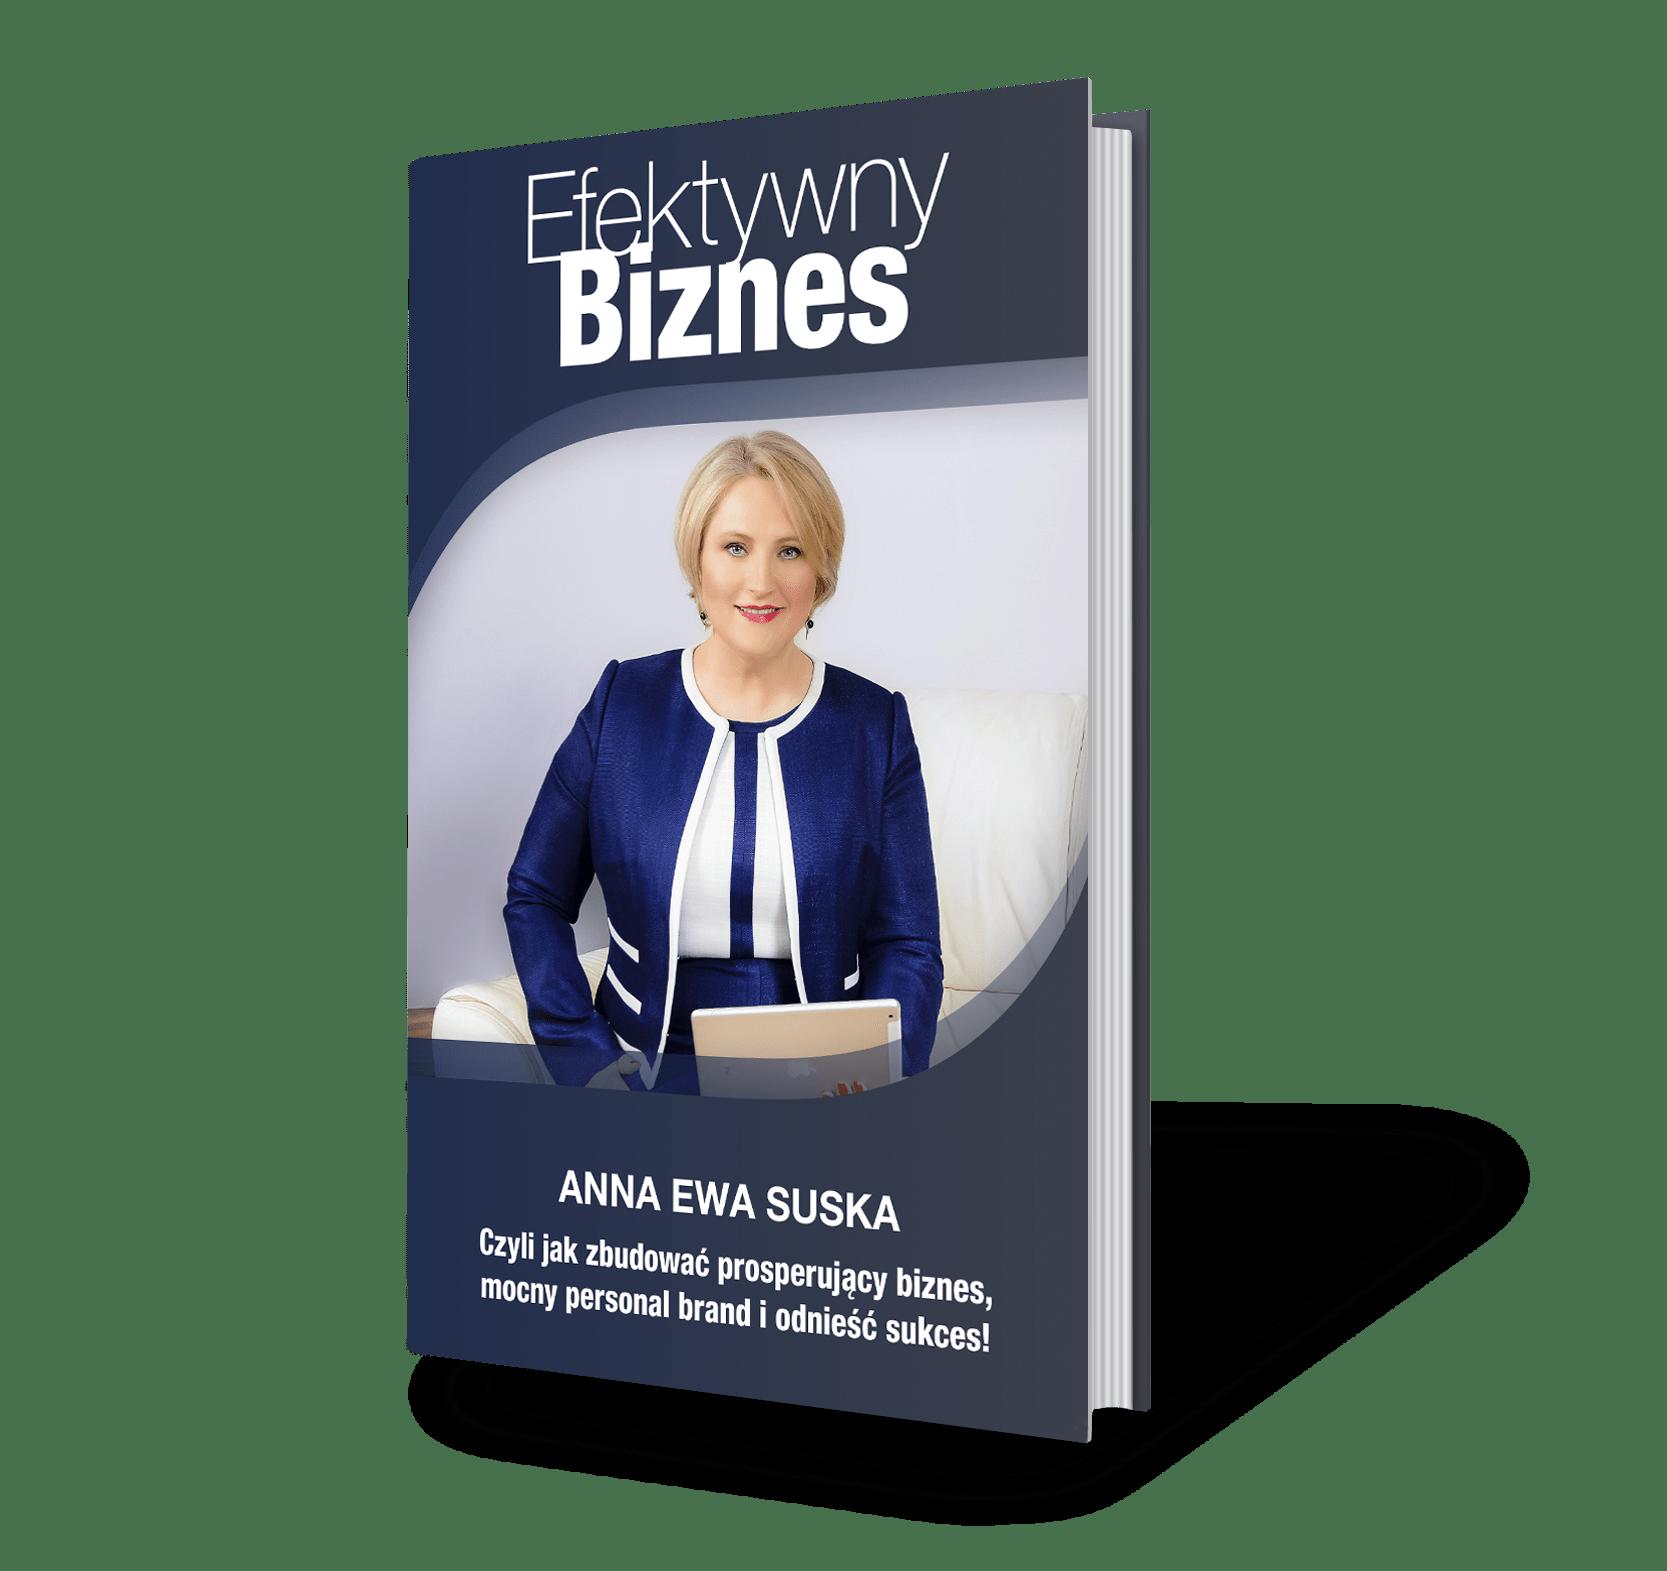 Efektywny biznes Anna Ewa Suska ExcellenceVale